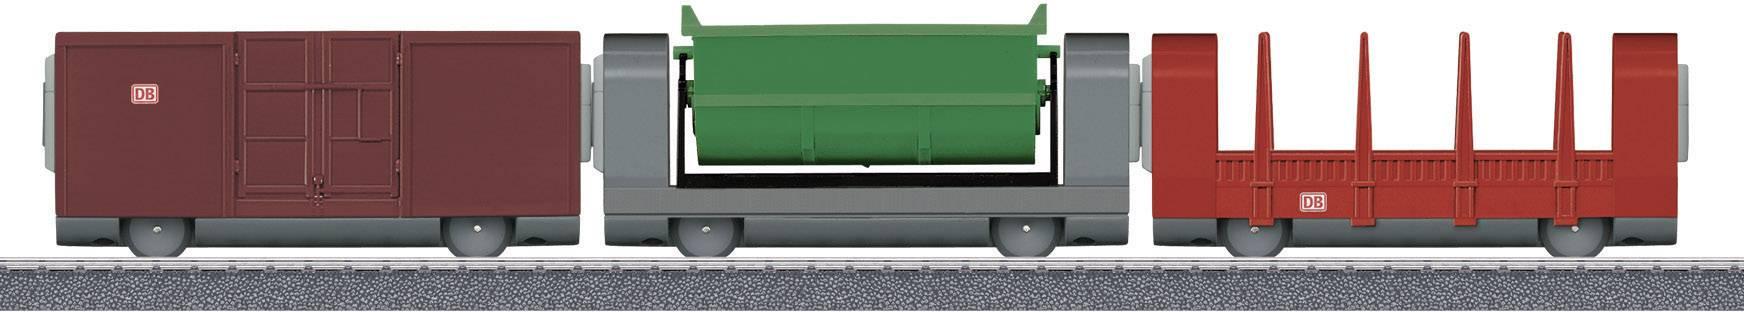 Nákladní vagóny H0 Märklin World 44100, sada 3 ks, magnetické spřáhlo